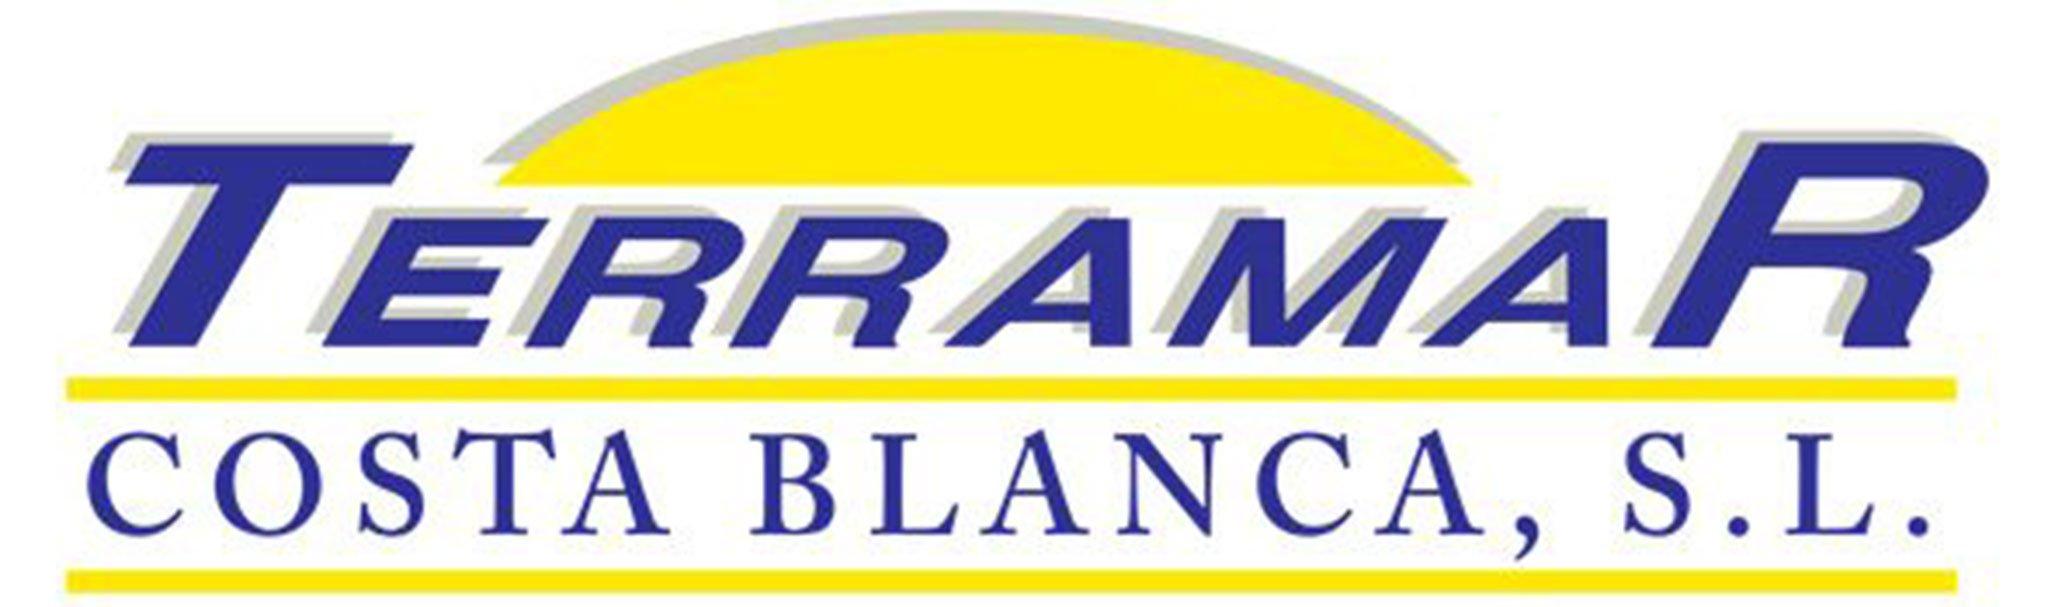 Logotip Terramar Costa Blanca